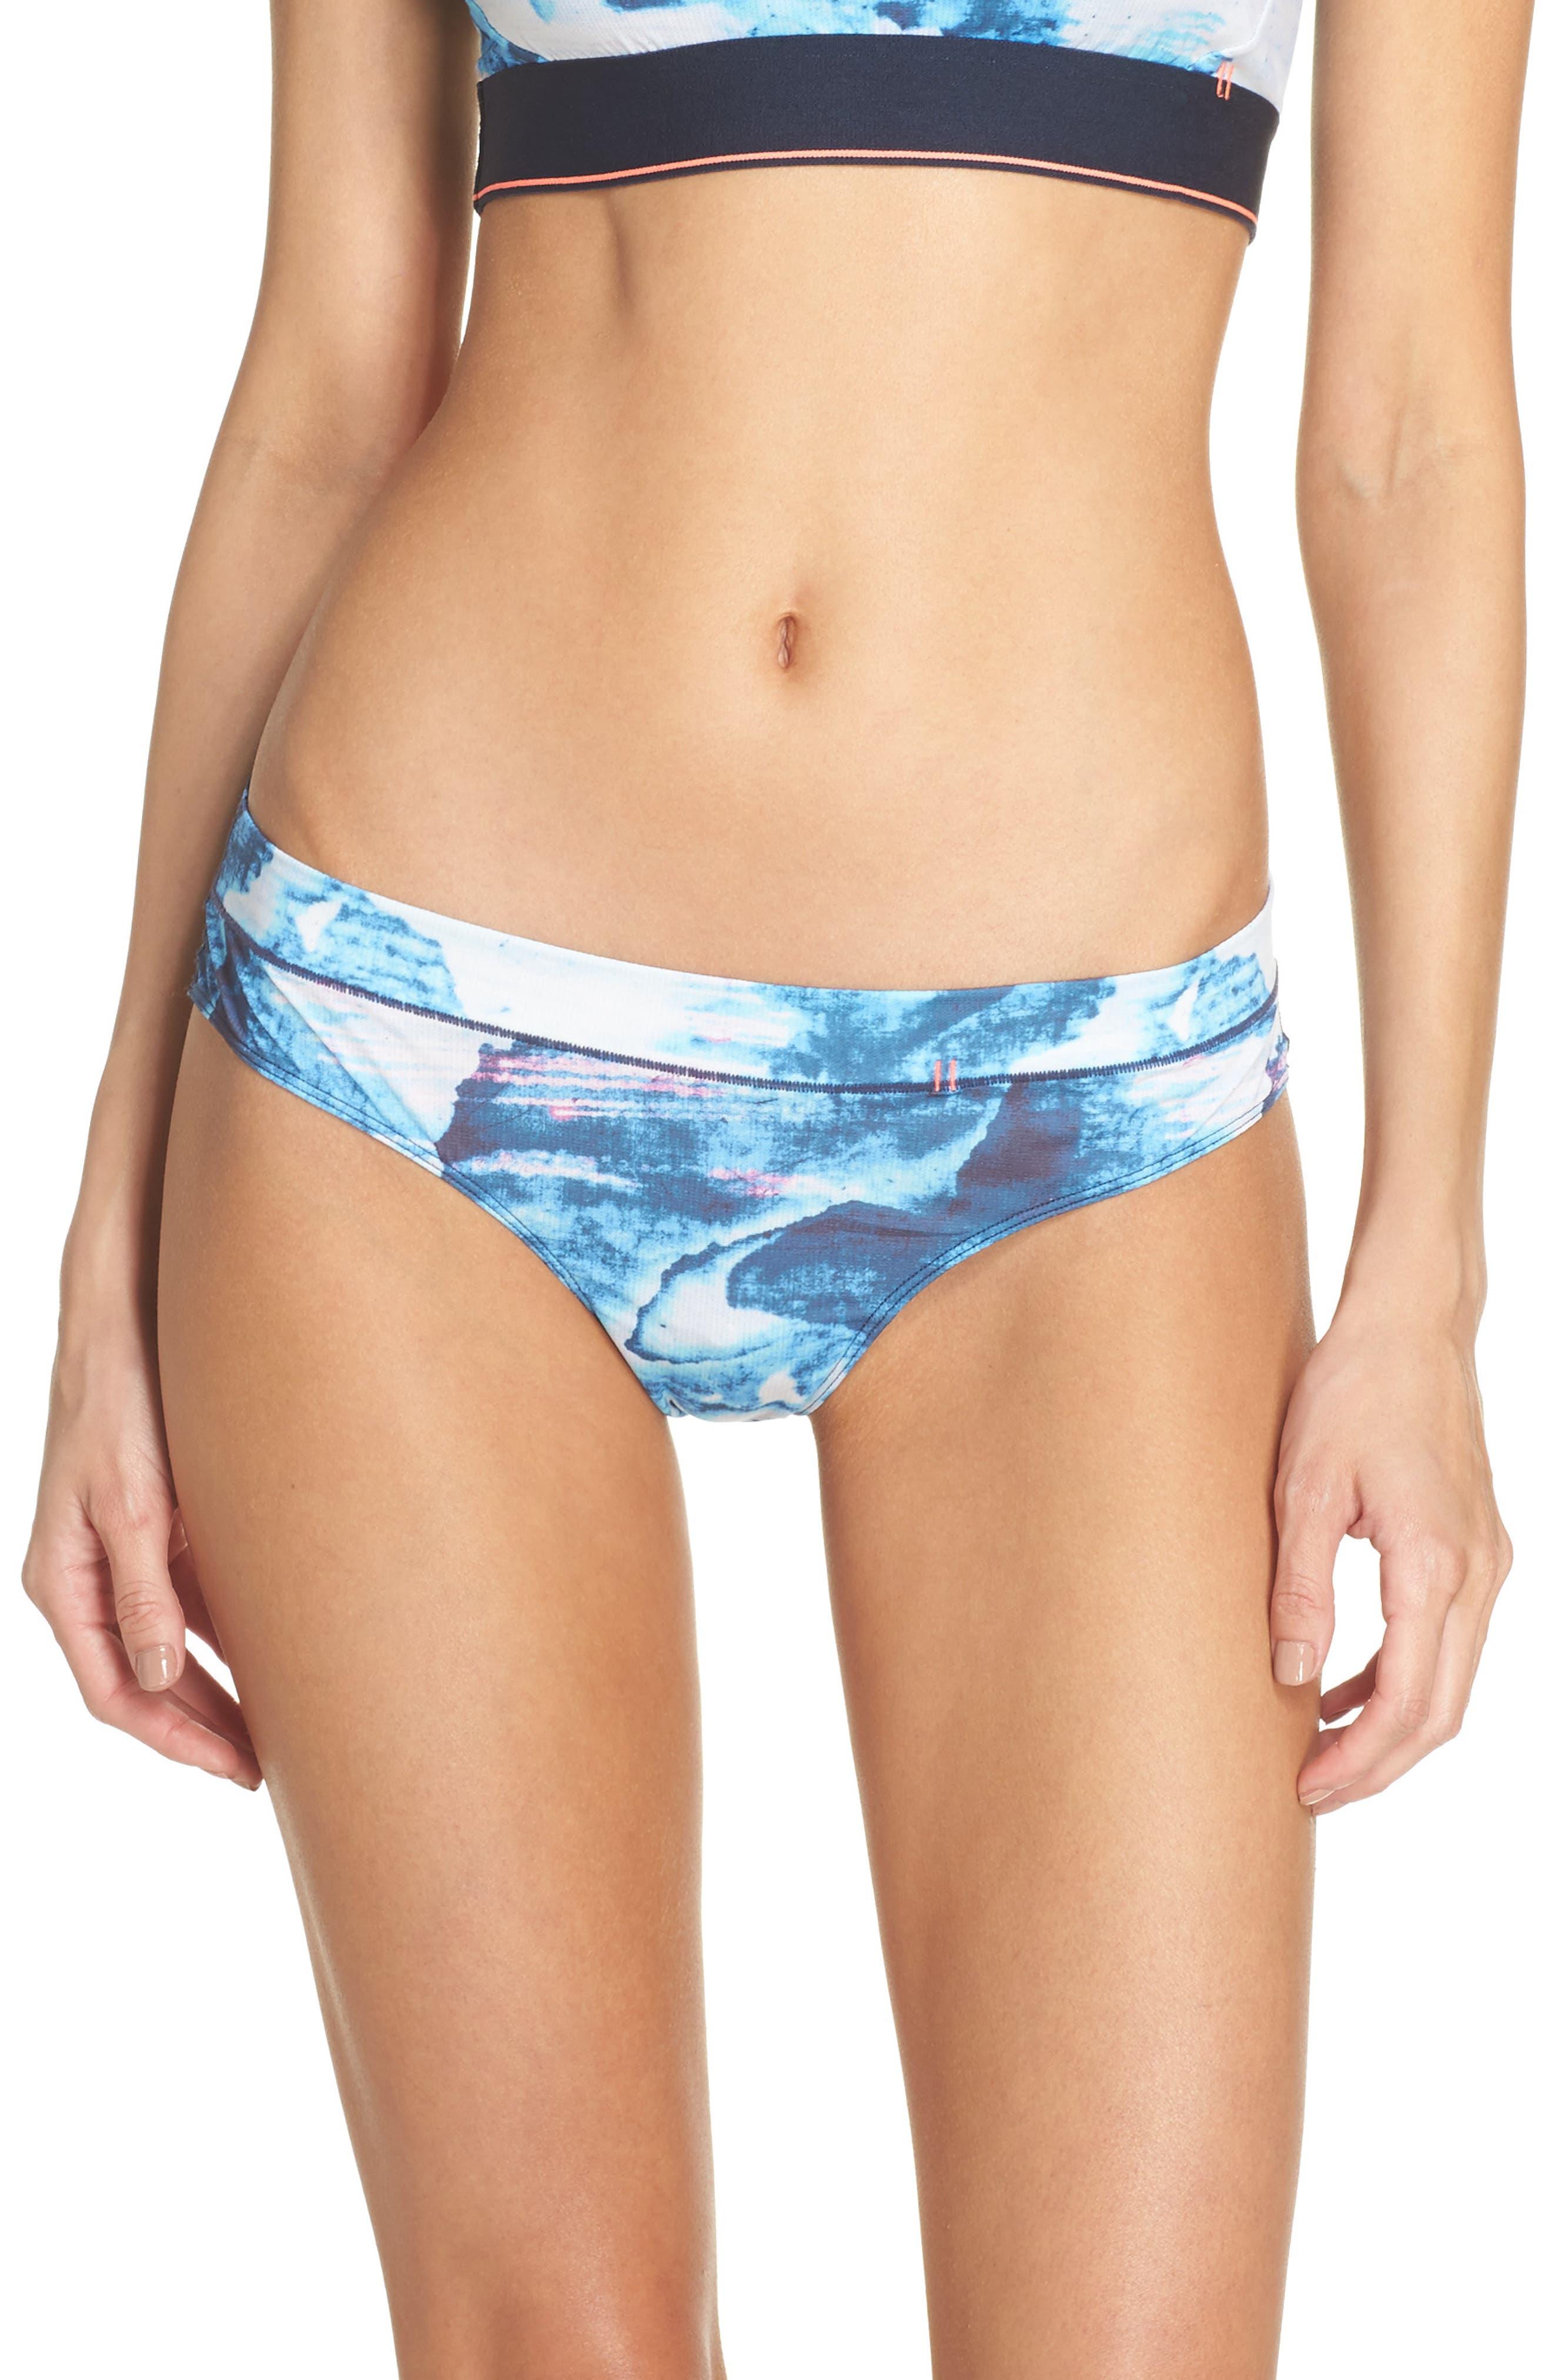 Tropic Storm Cheeky Bikini,                             Main thumbnail 1, color,                             Navy